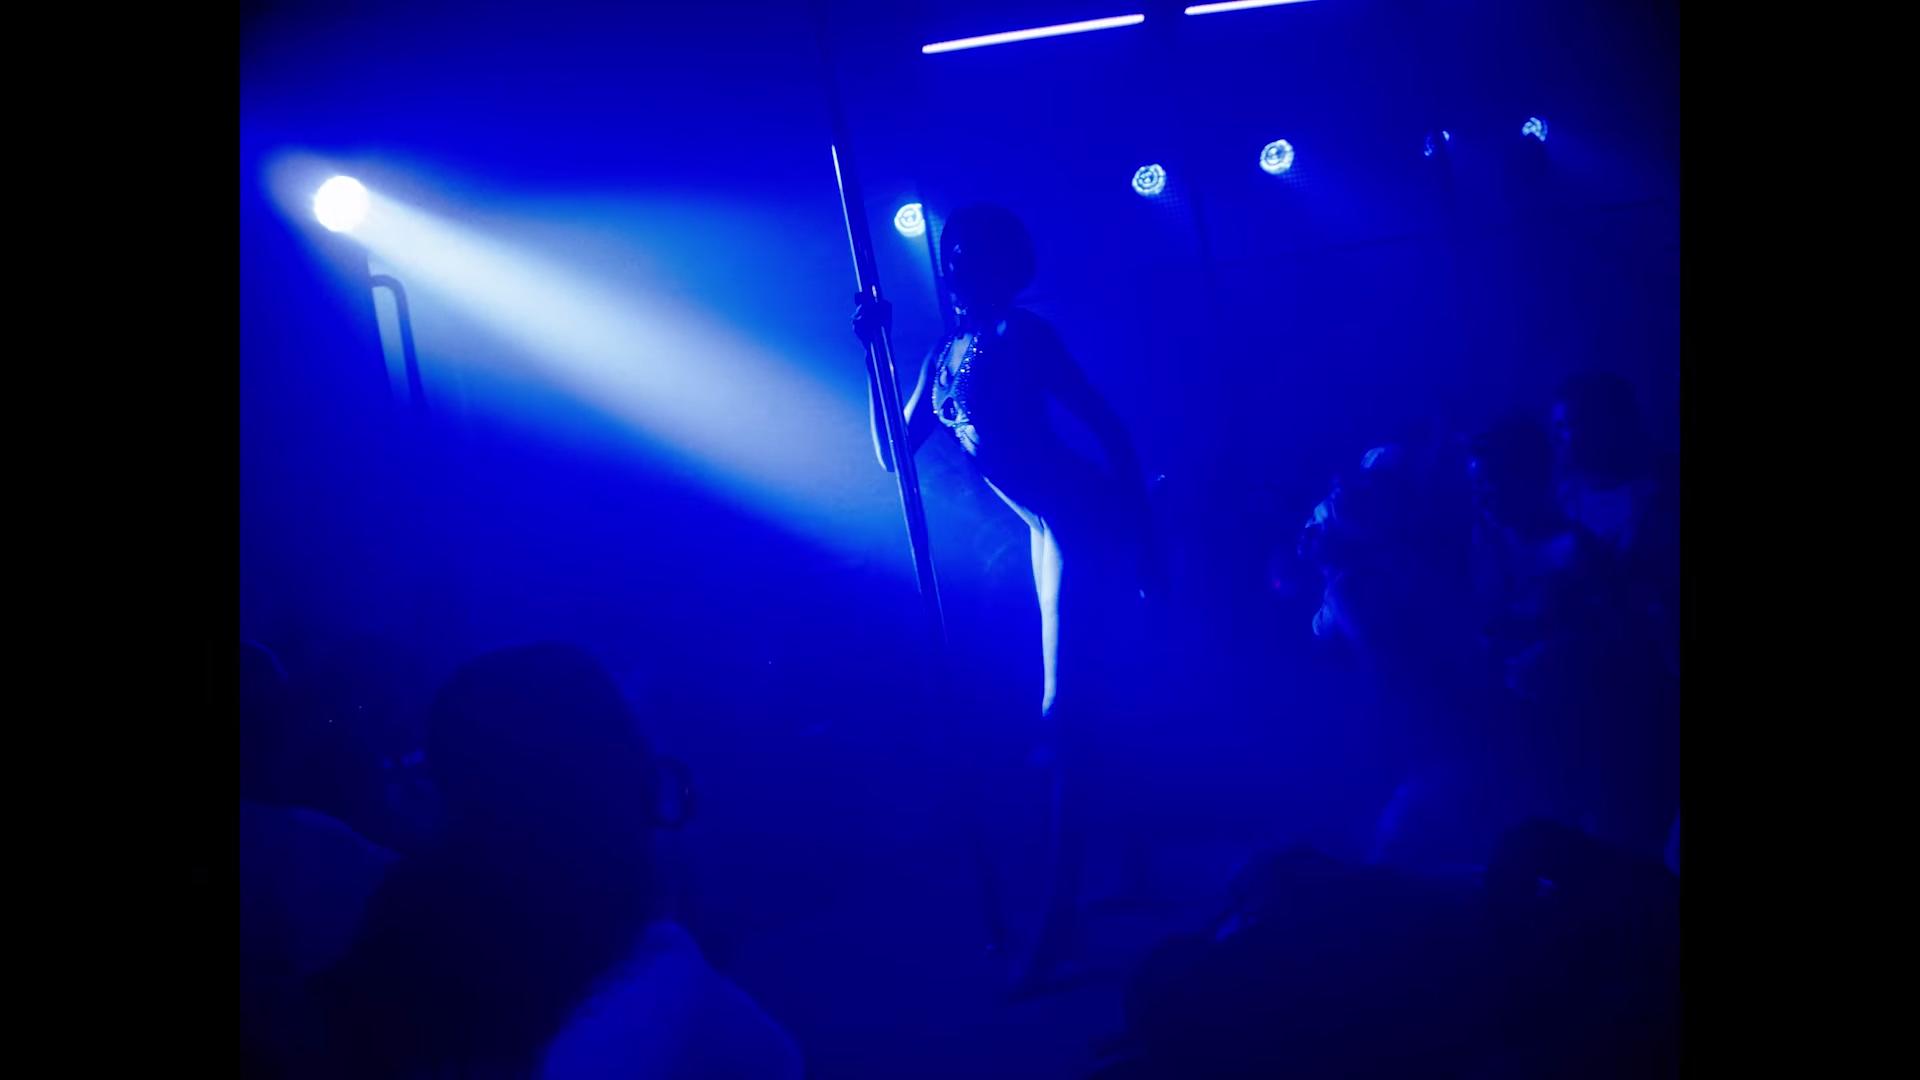 Popcaan - Body So Good (Official Video) 1-48 screenshot